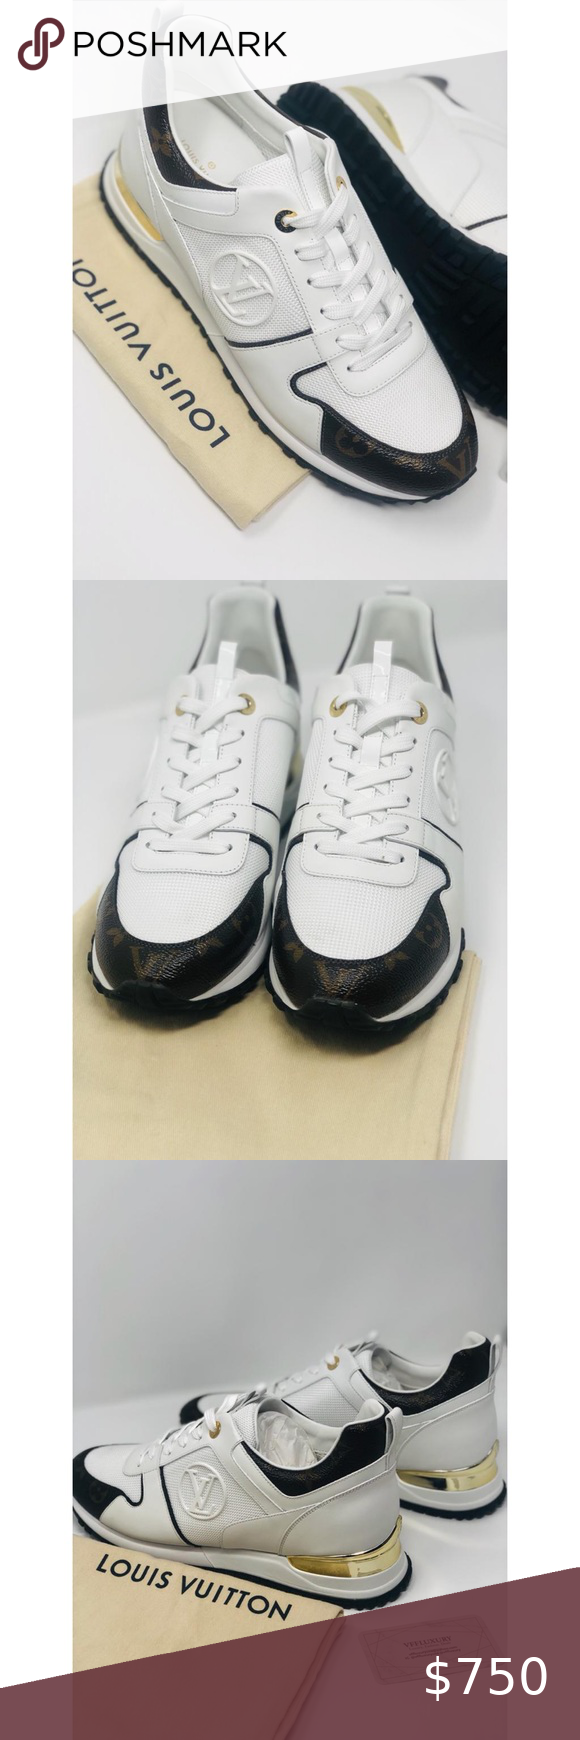 Louis Vuitton run away sneakers 1A4XNL